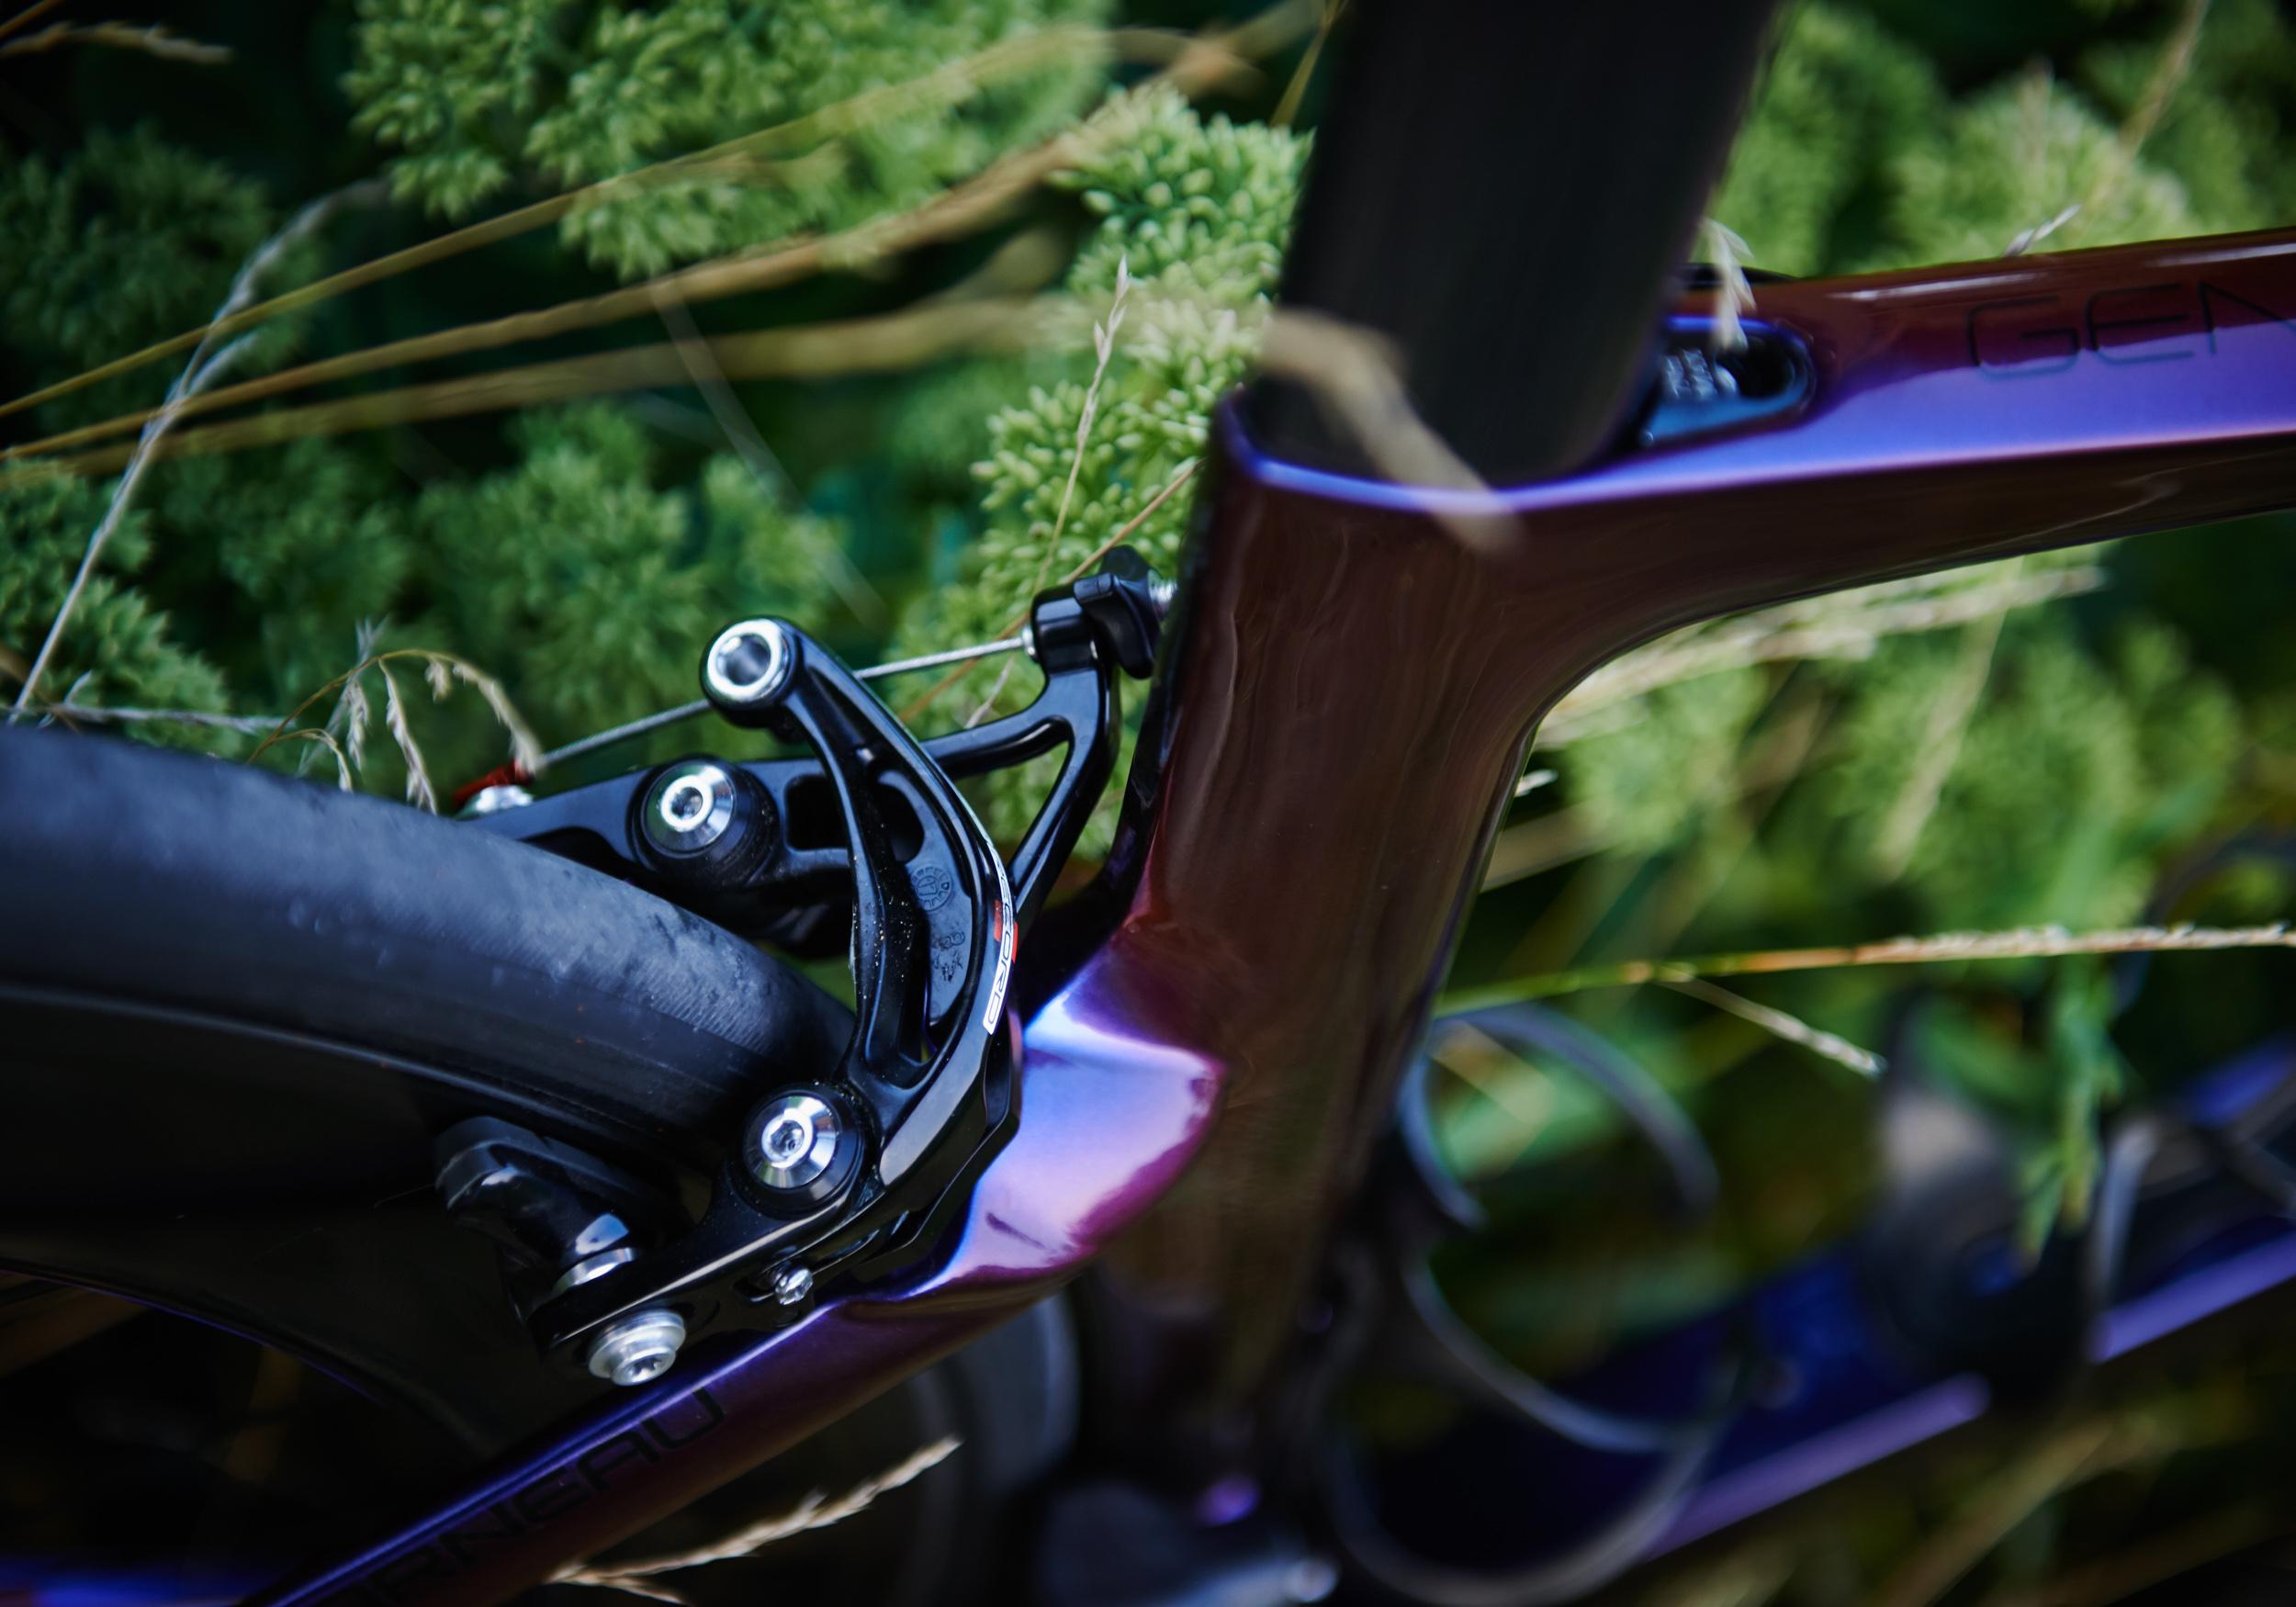 to-be-determined-garneau-a1-bike-review-107.jpg